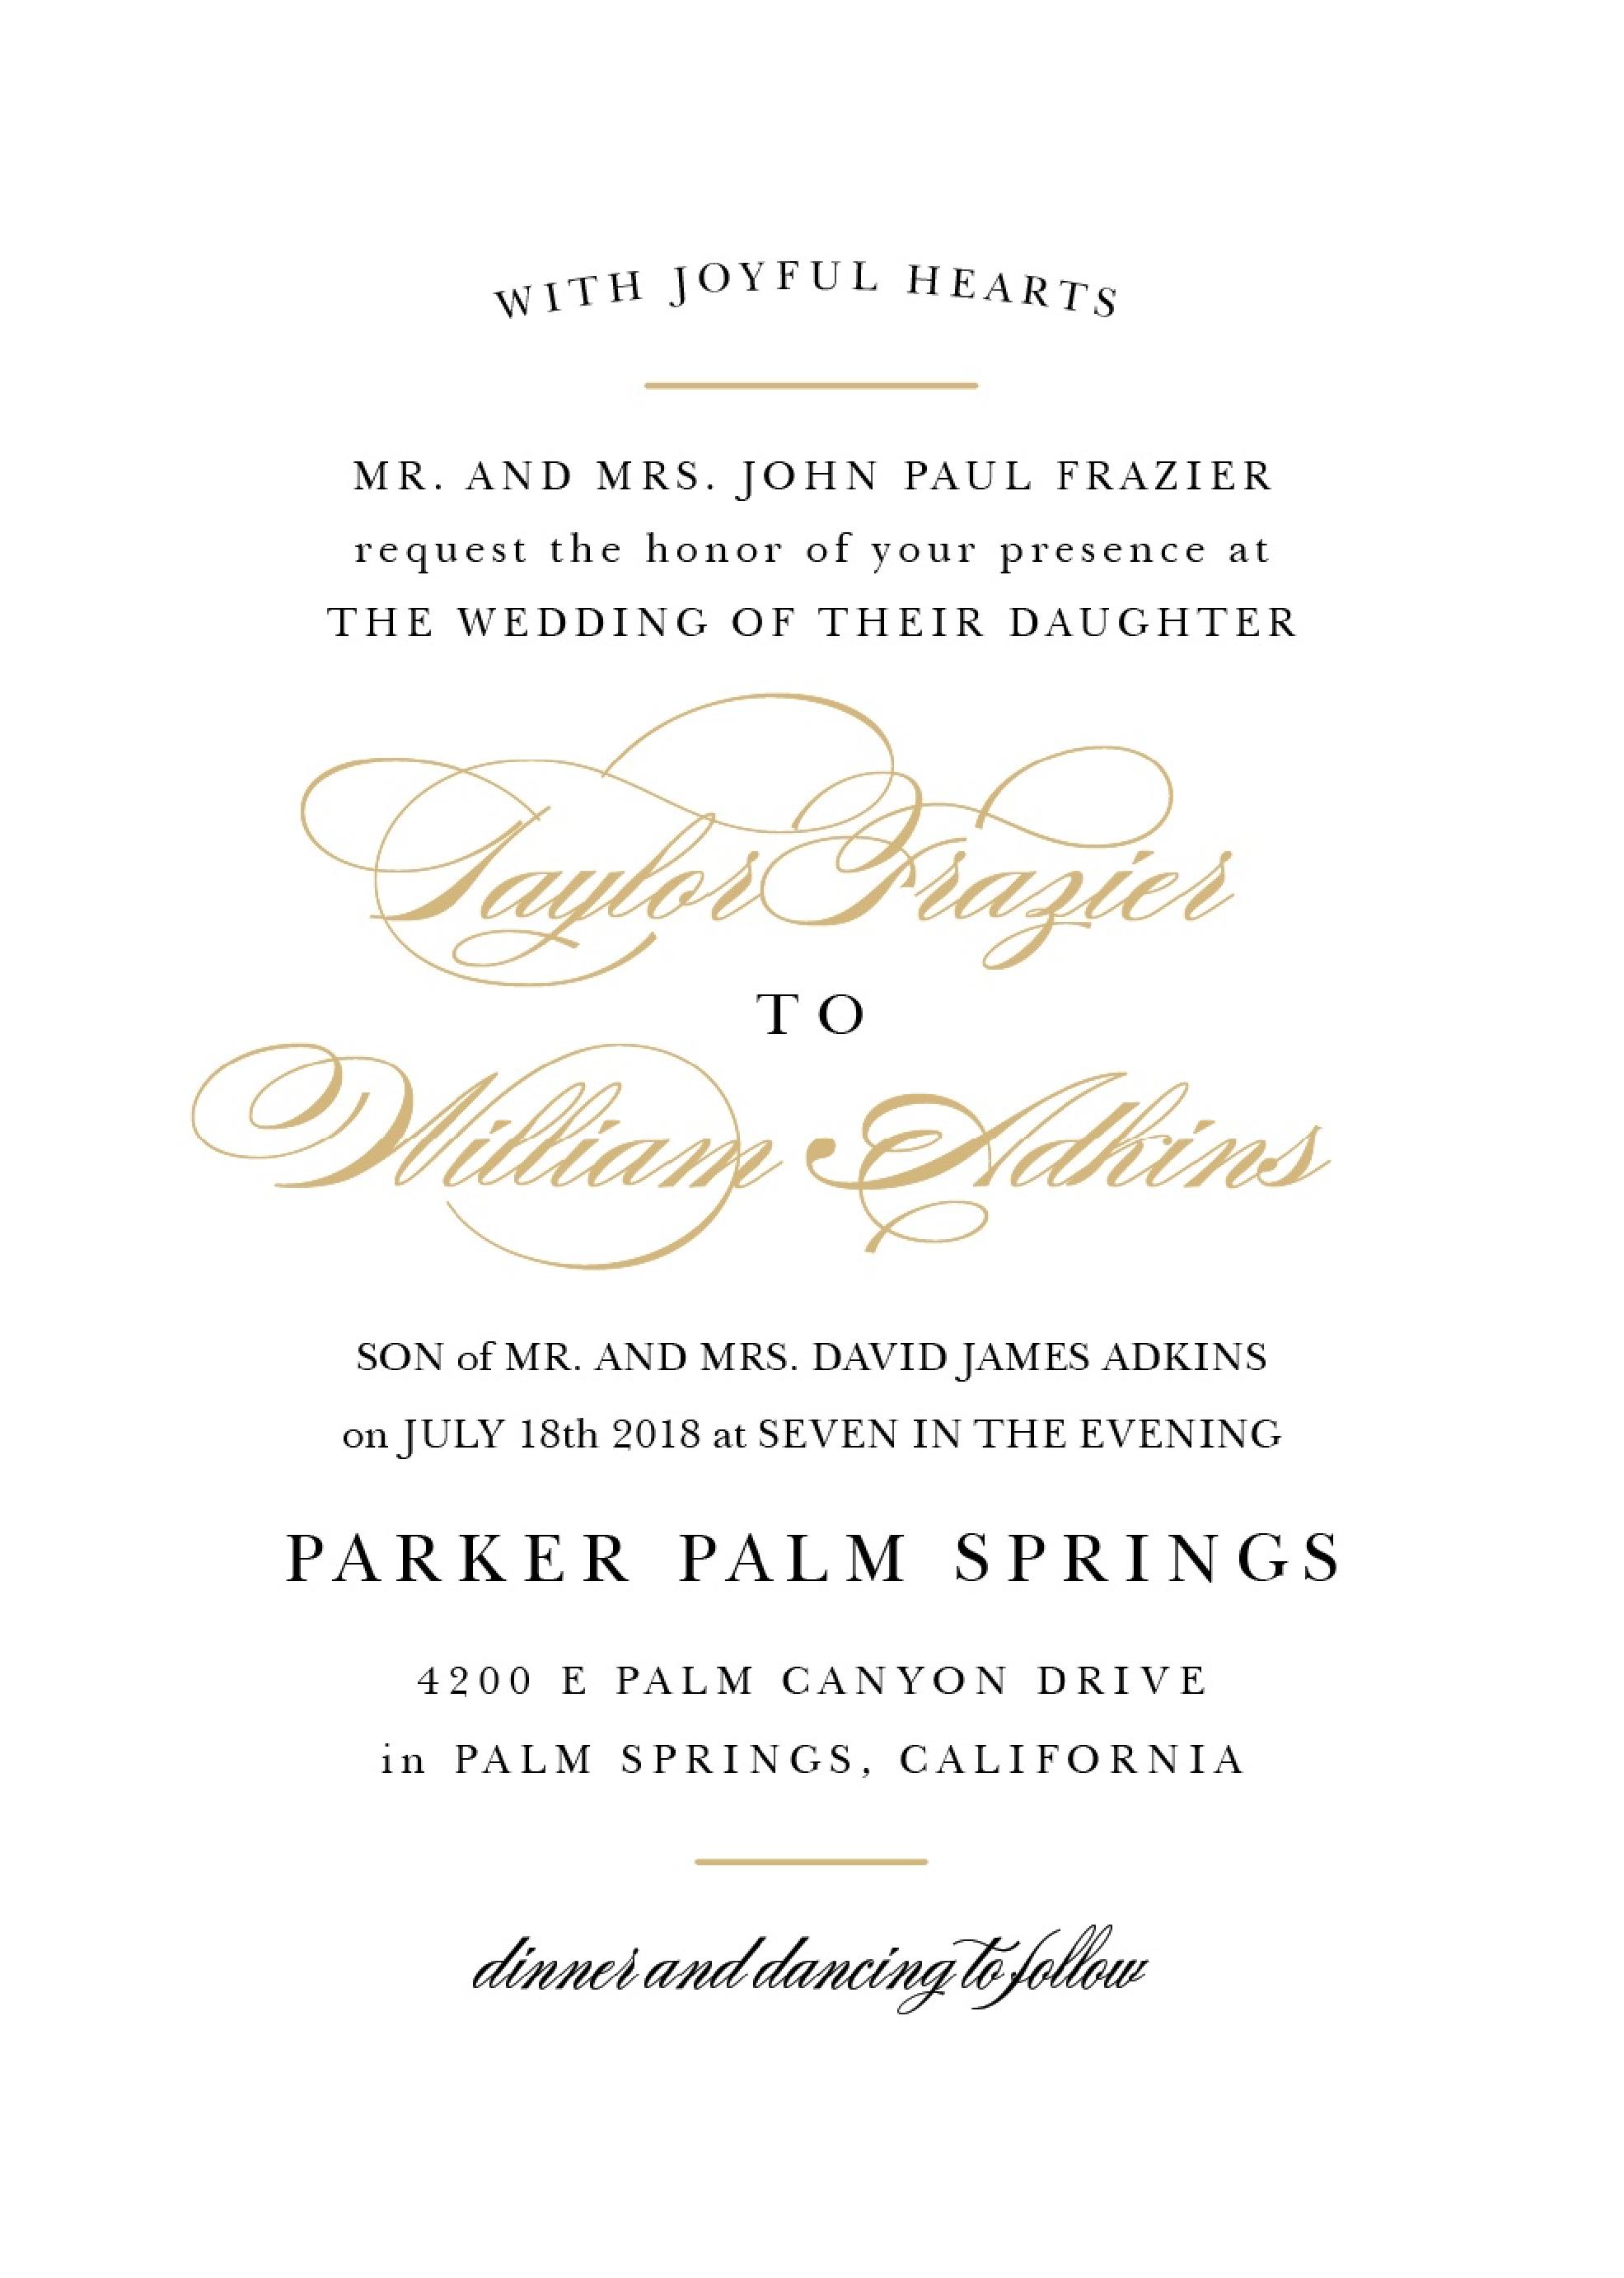 37 Adding Example Of Wedding Invitation With Reception Wording Download by Example Of Wedding Invitation With Reception Wording